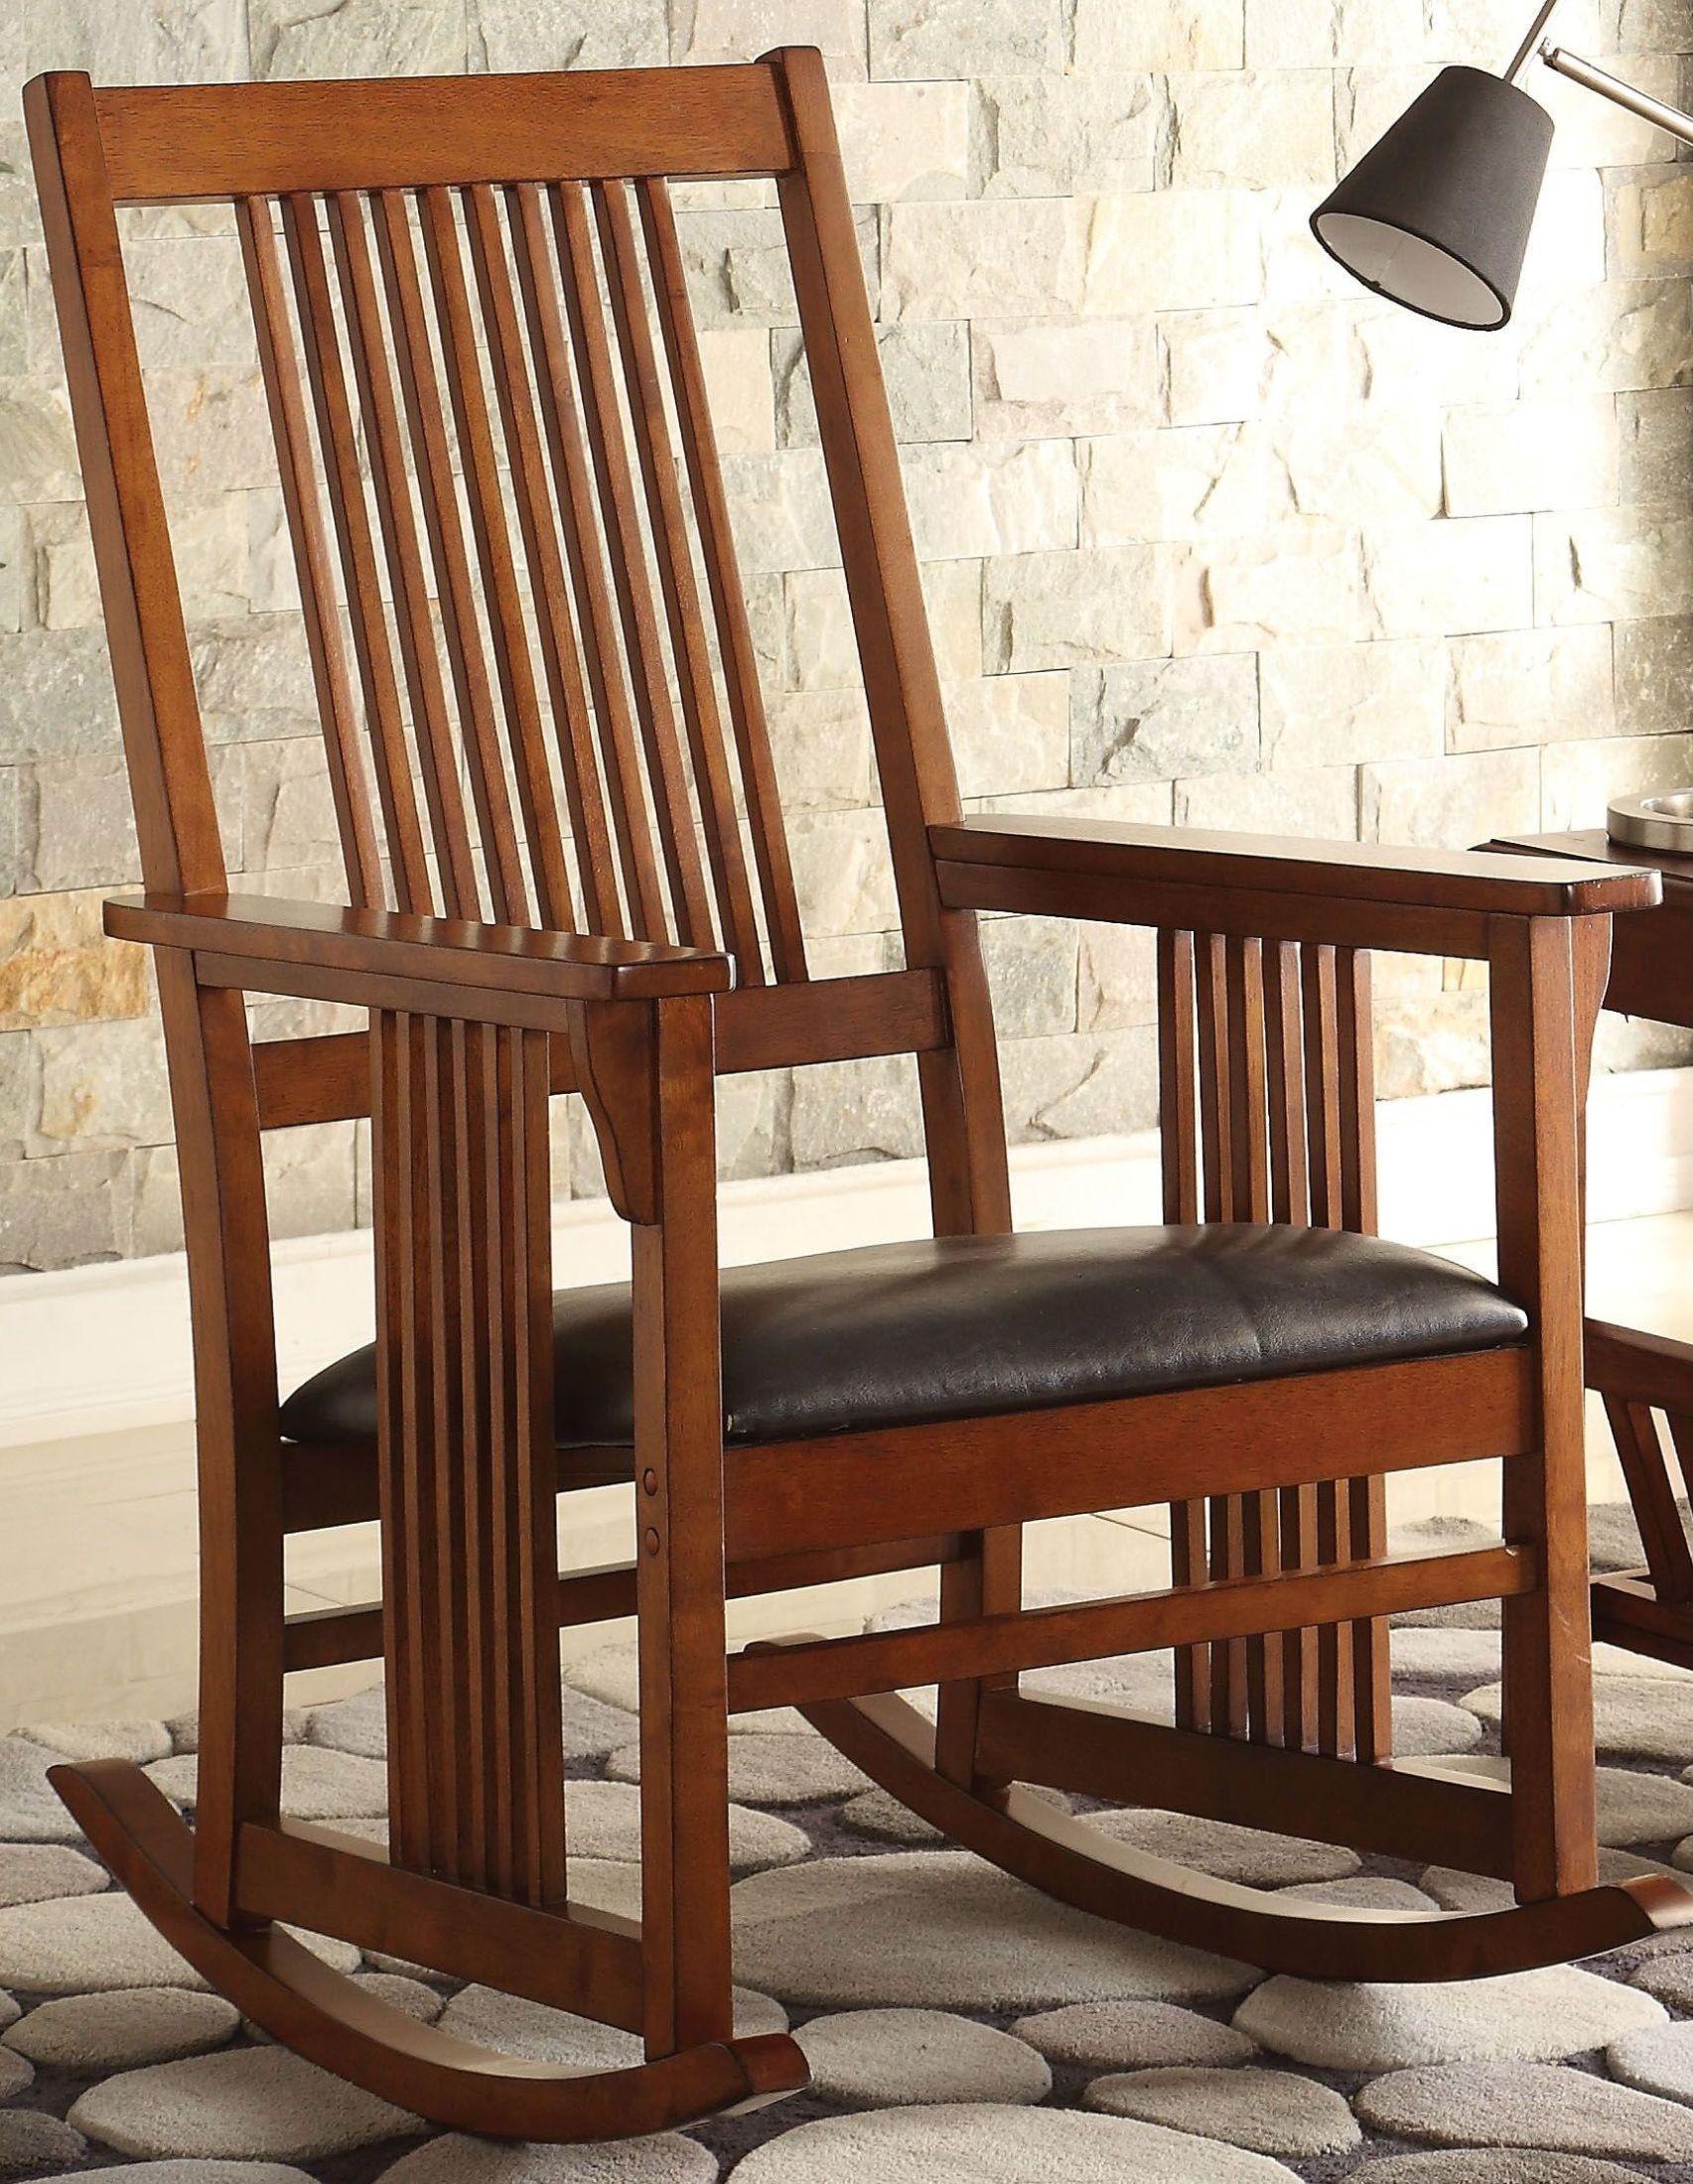 Kloris Tobacco Wooden Rocking Chair Pertaining To Tobacco Brown Wooden Rocking Chairs (#12 of 20)